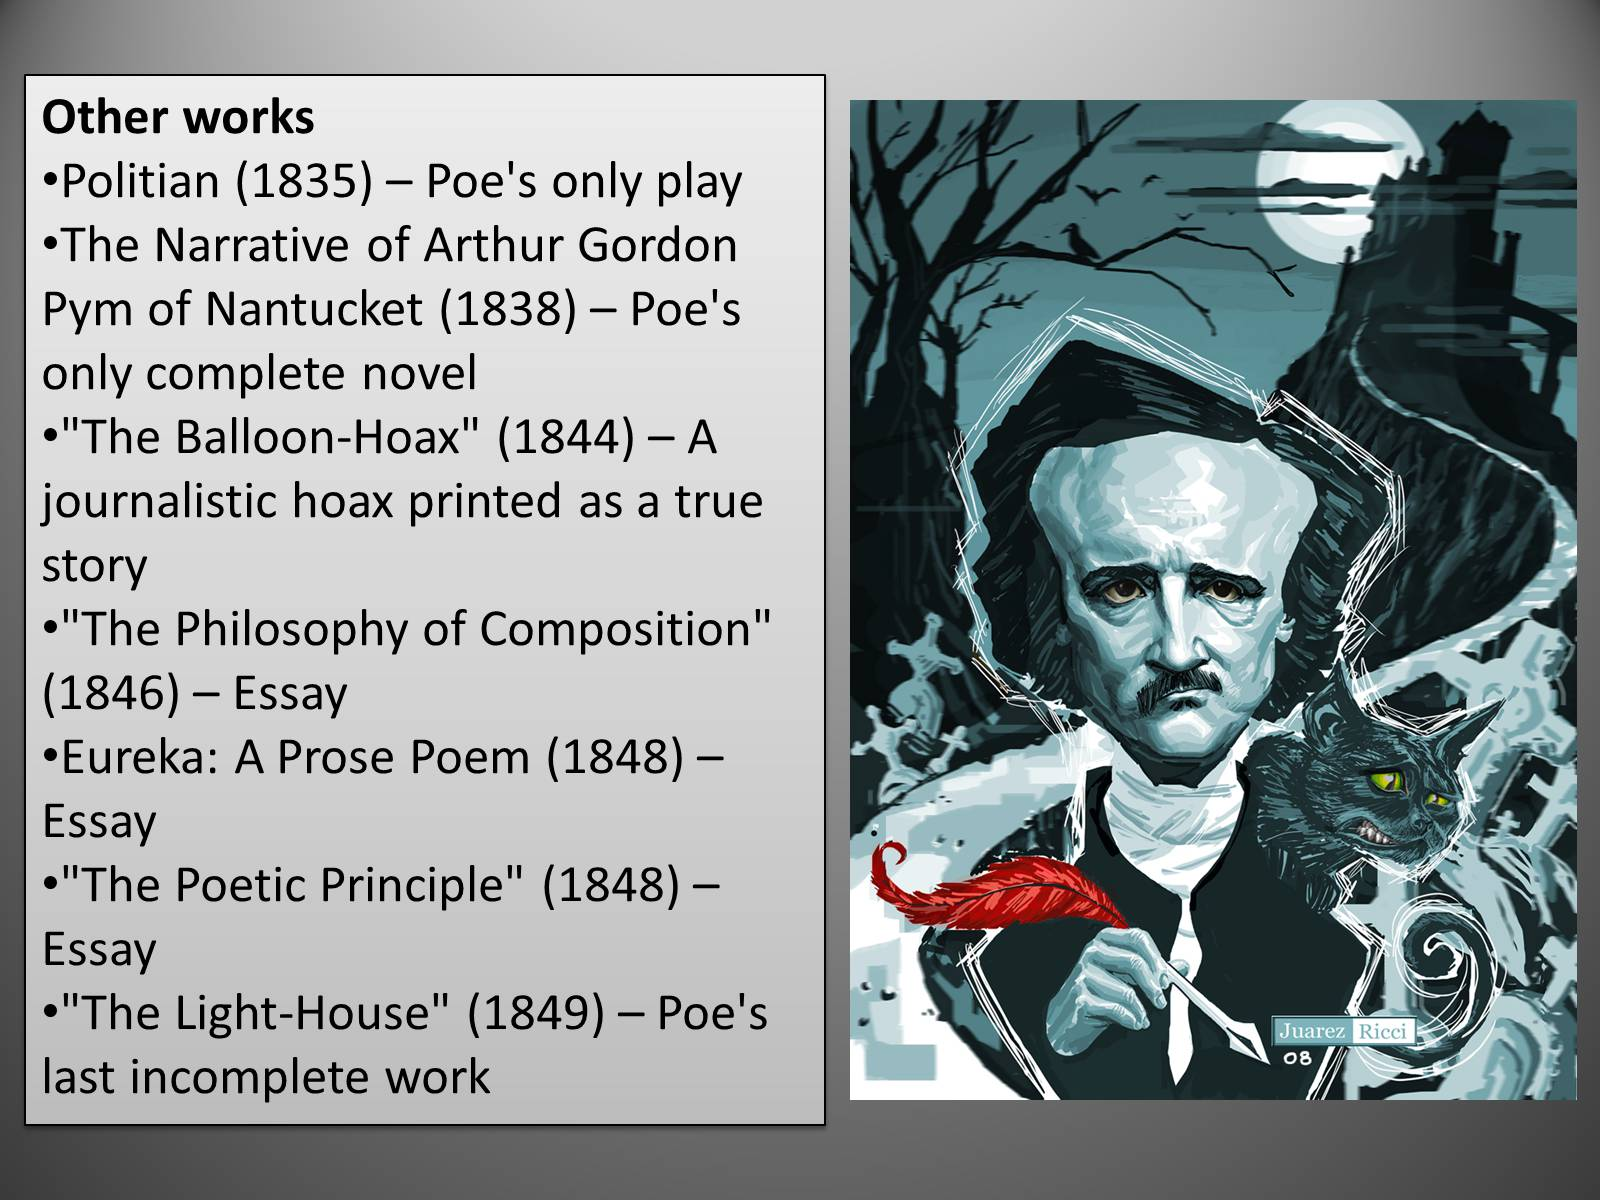 literary analysis of edgar allan poe